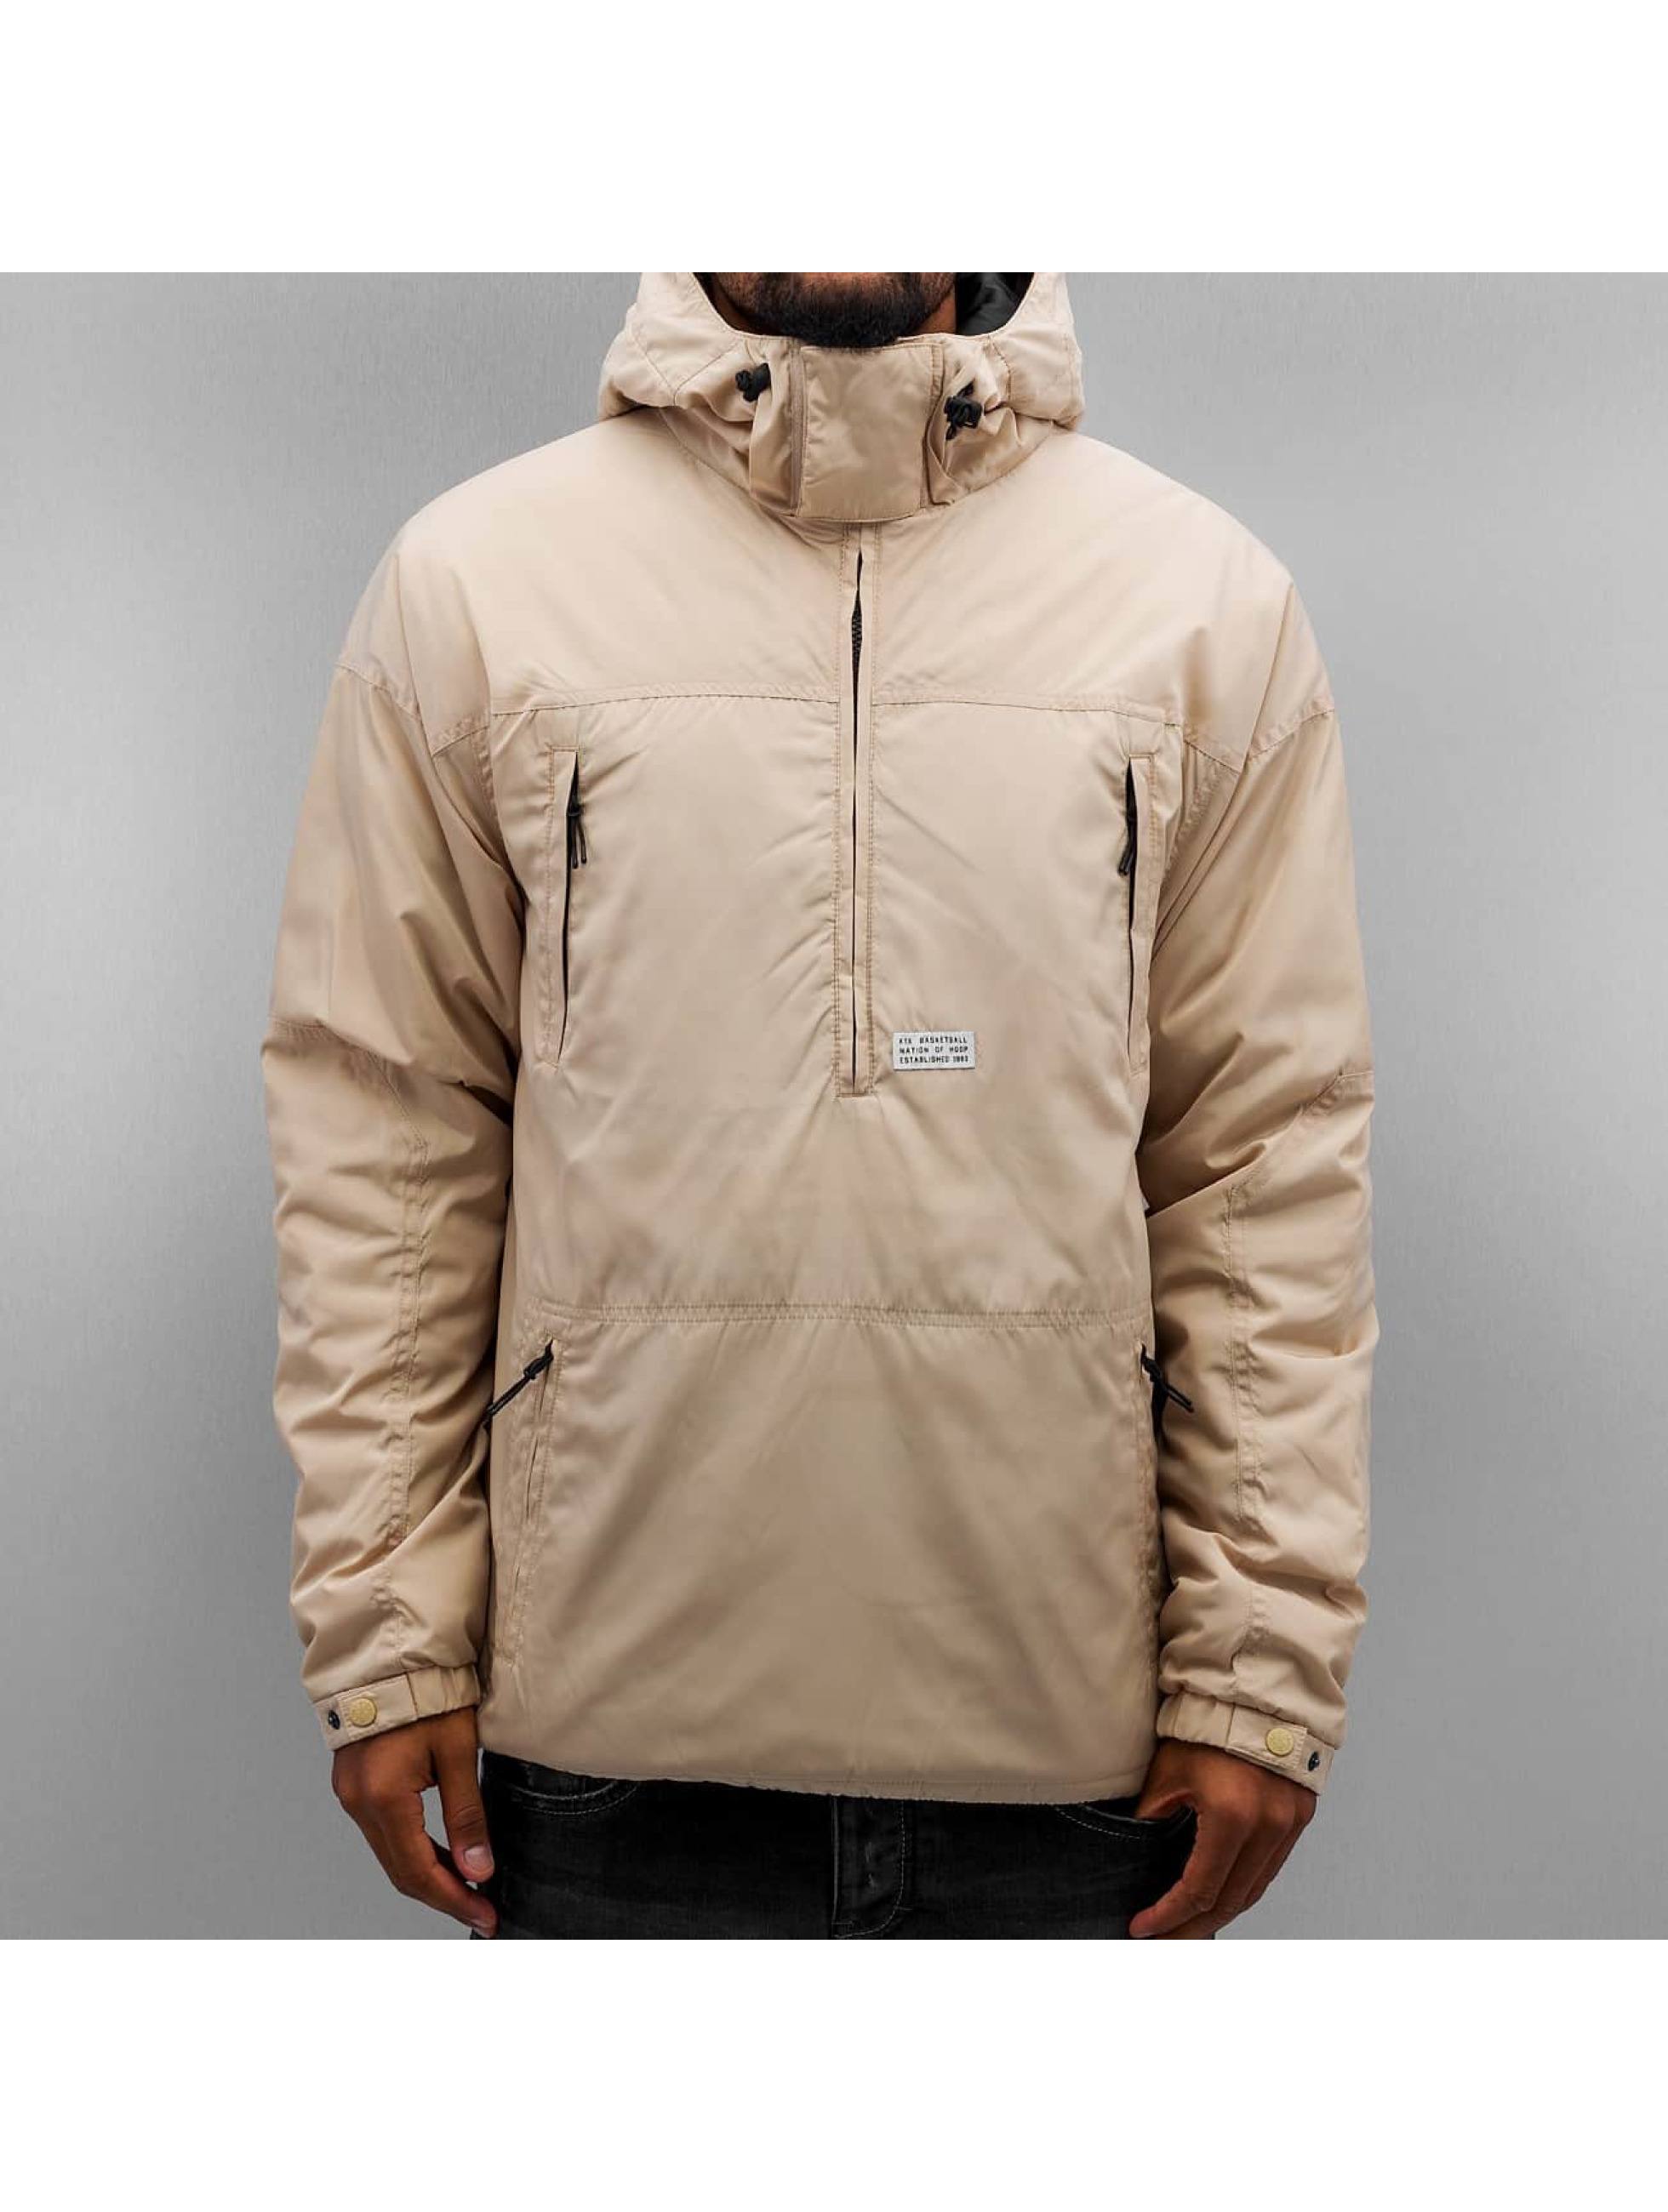 K1X Transitional Jackets Urban Hooded beige